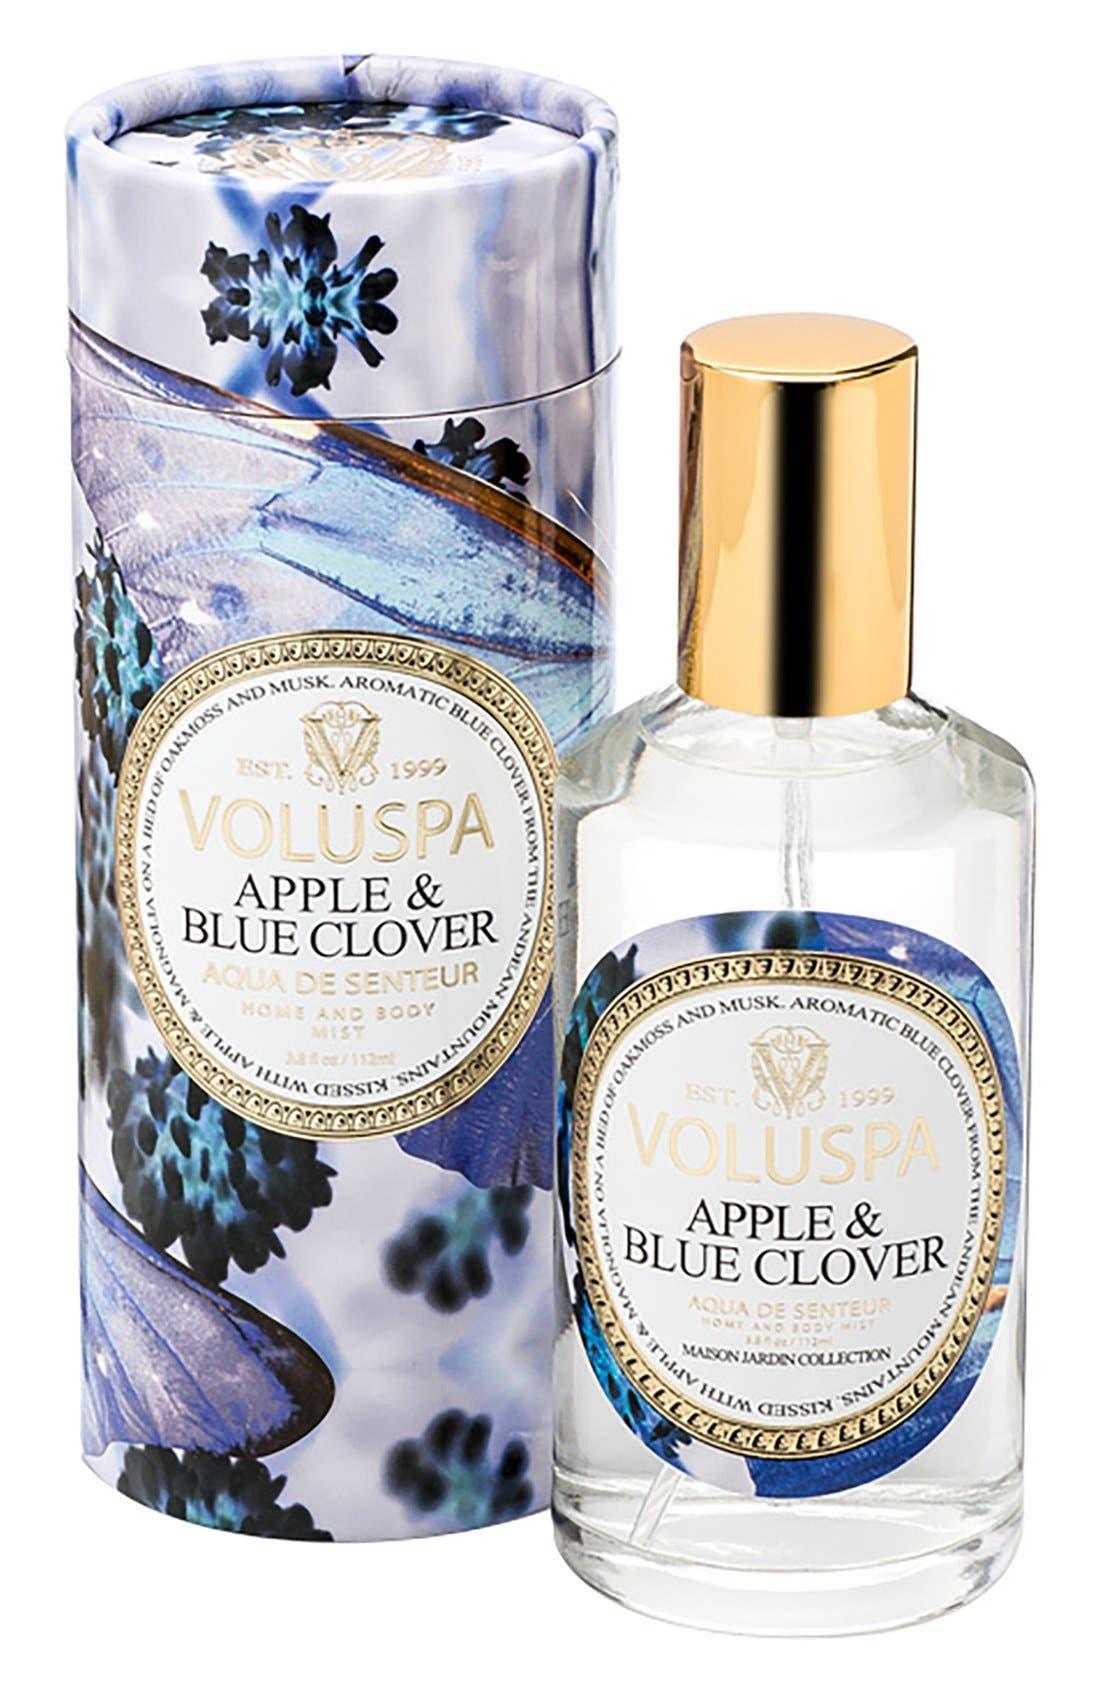 Voluspa 'Maison Jardin - Apple & Blue Clover' Home & Body Mist